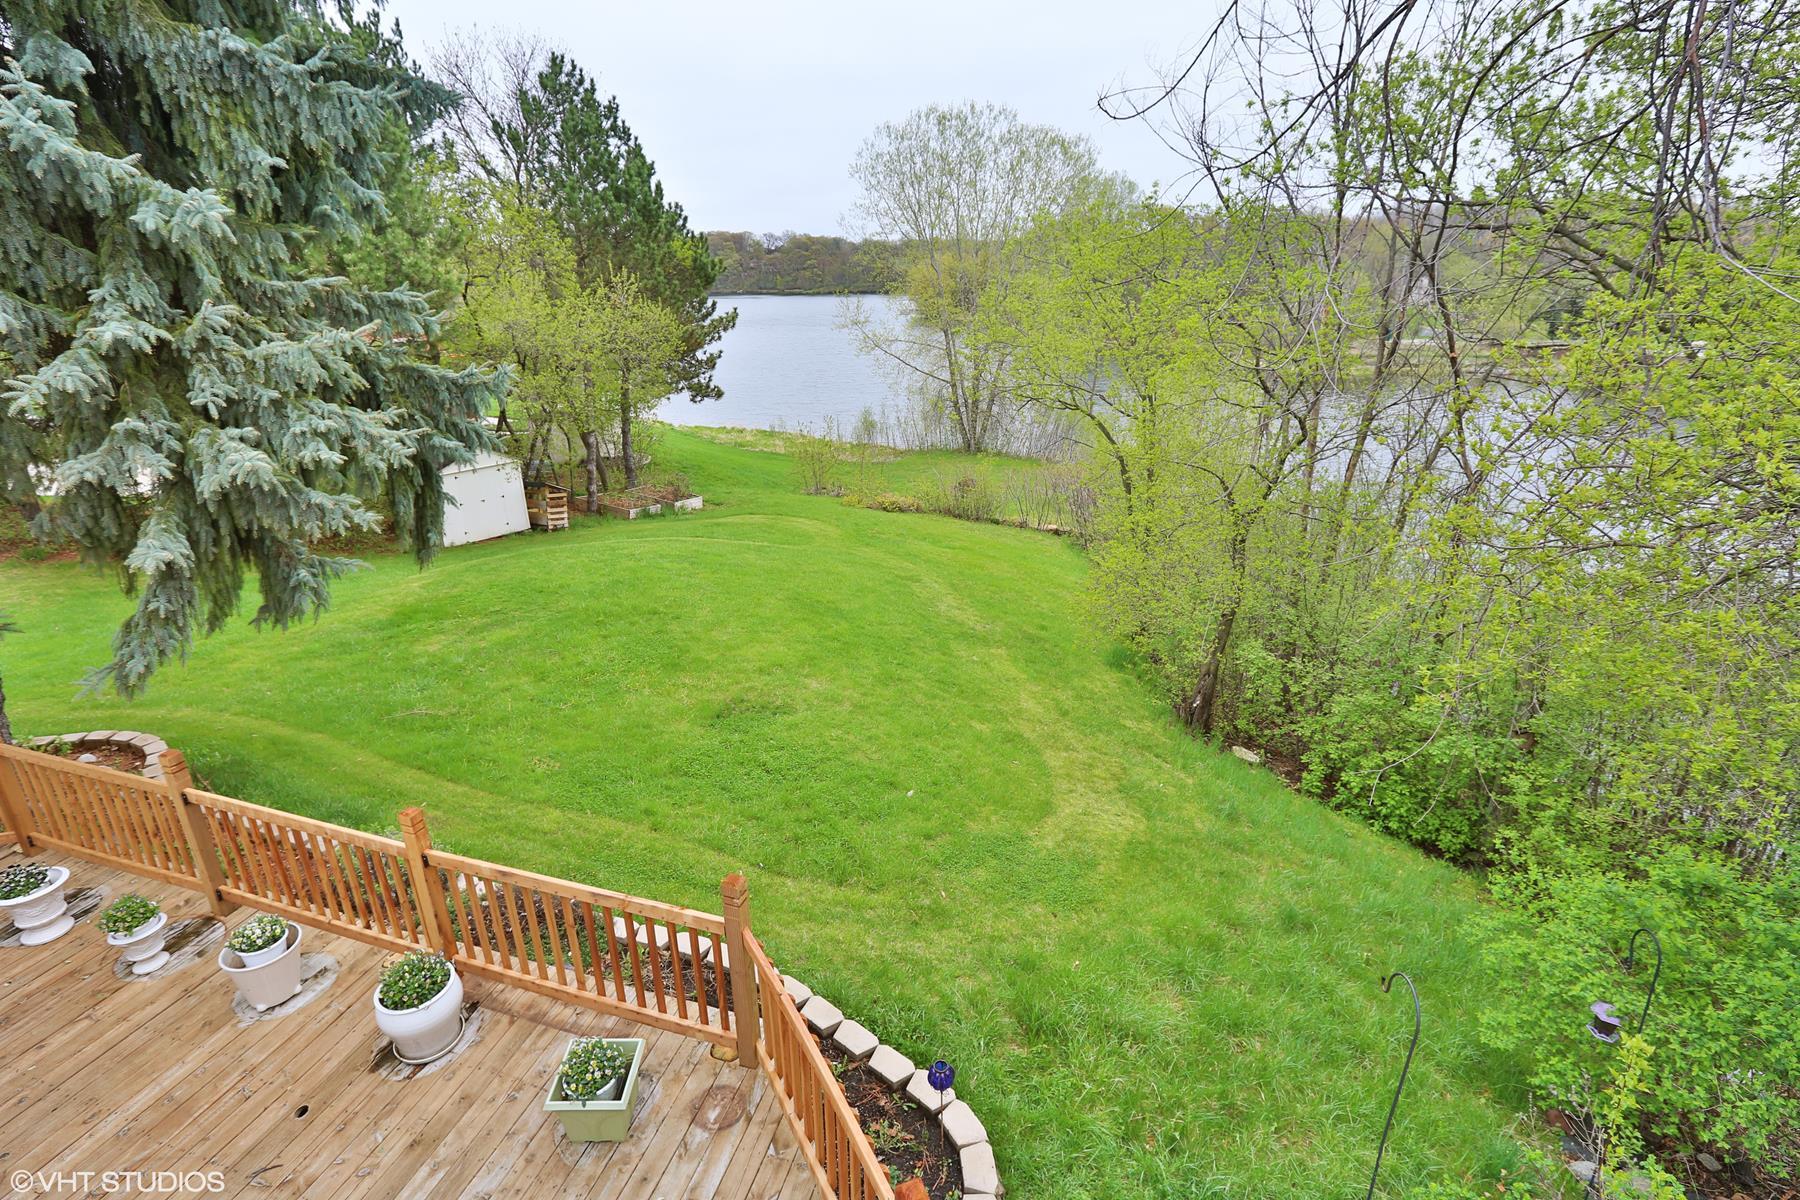 Single Family Home for Sale at 15335 Flag Avenue S Prior Lake, Minnesota, 55372 United States